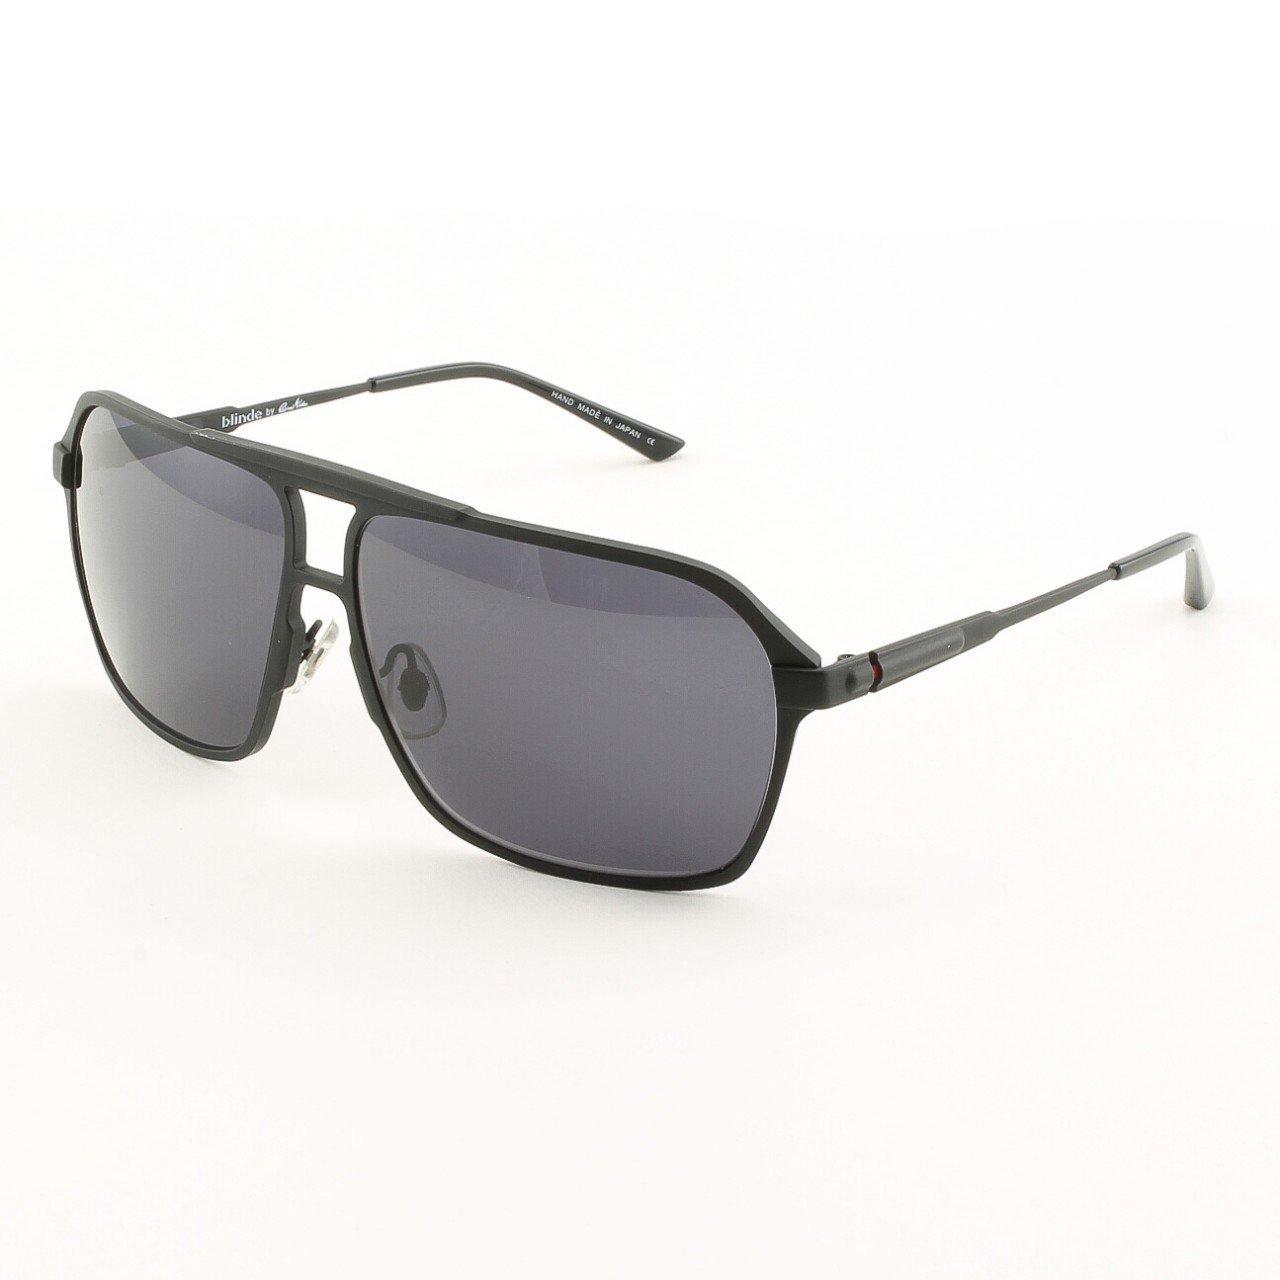 Blinde Most Unhonorable Unisex Sunglasses Col. Matte Black with Black Lenses